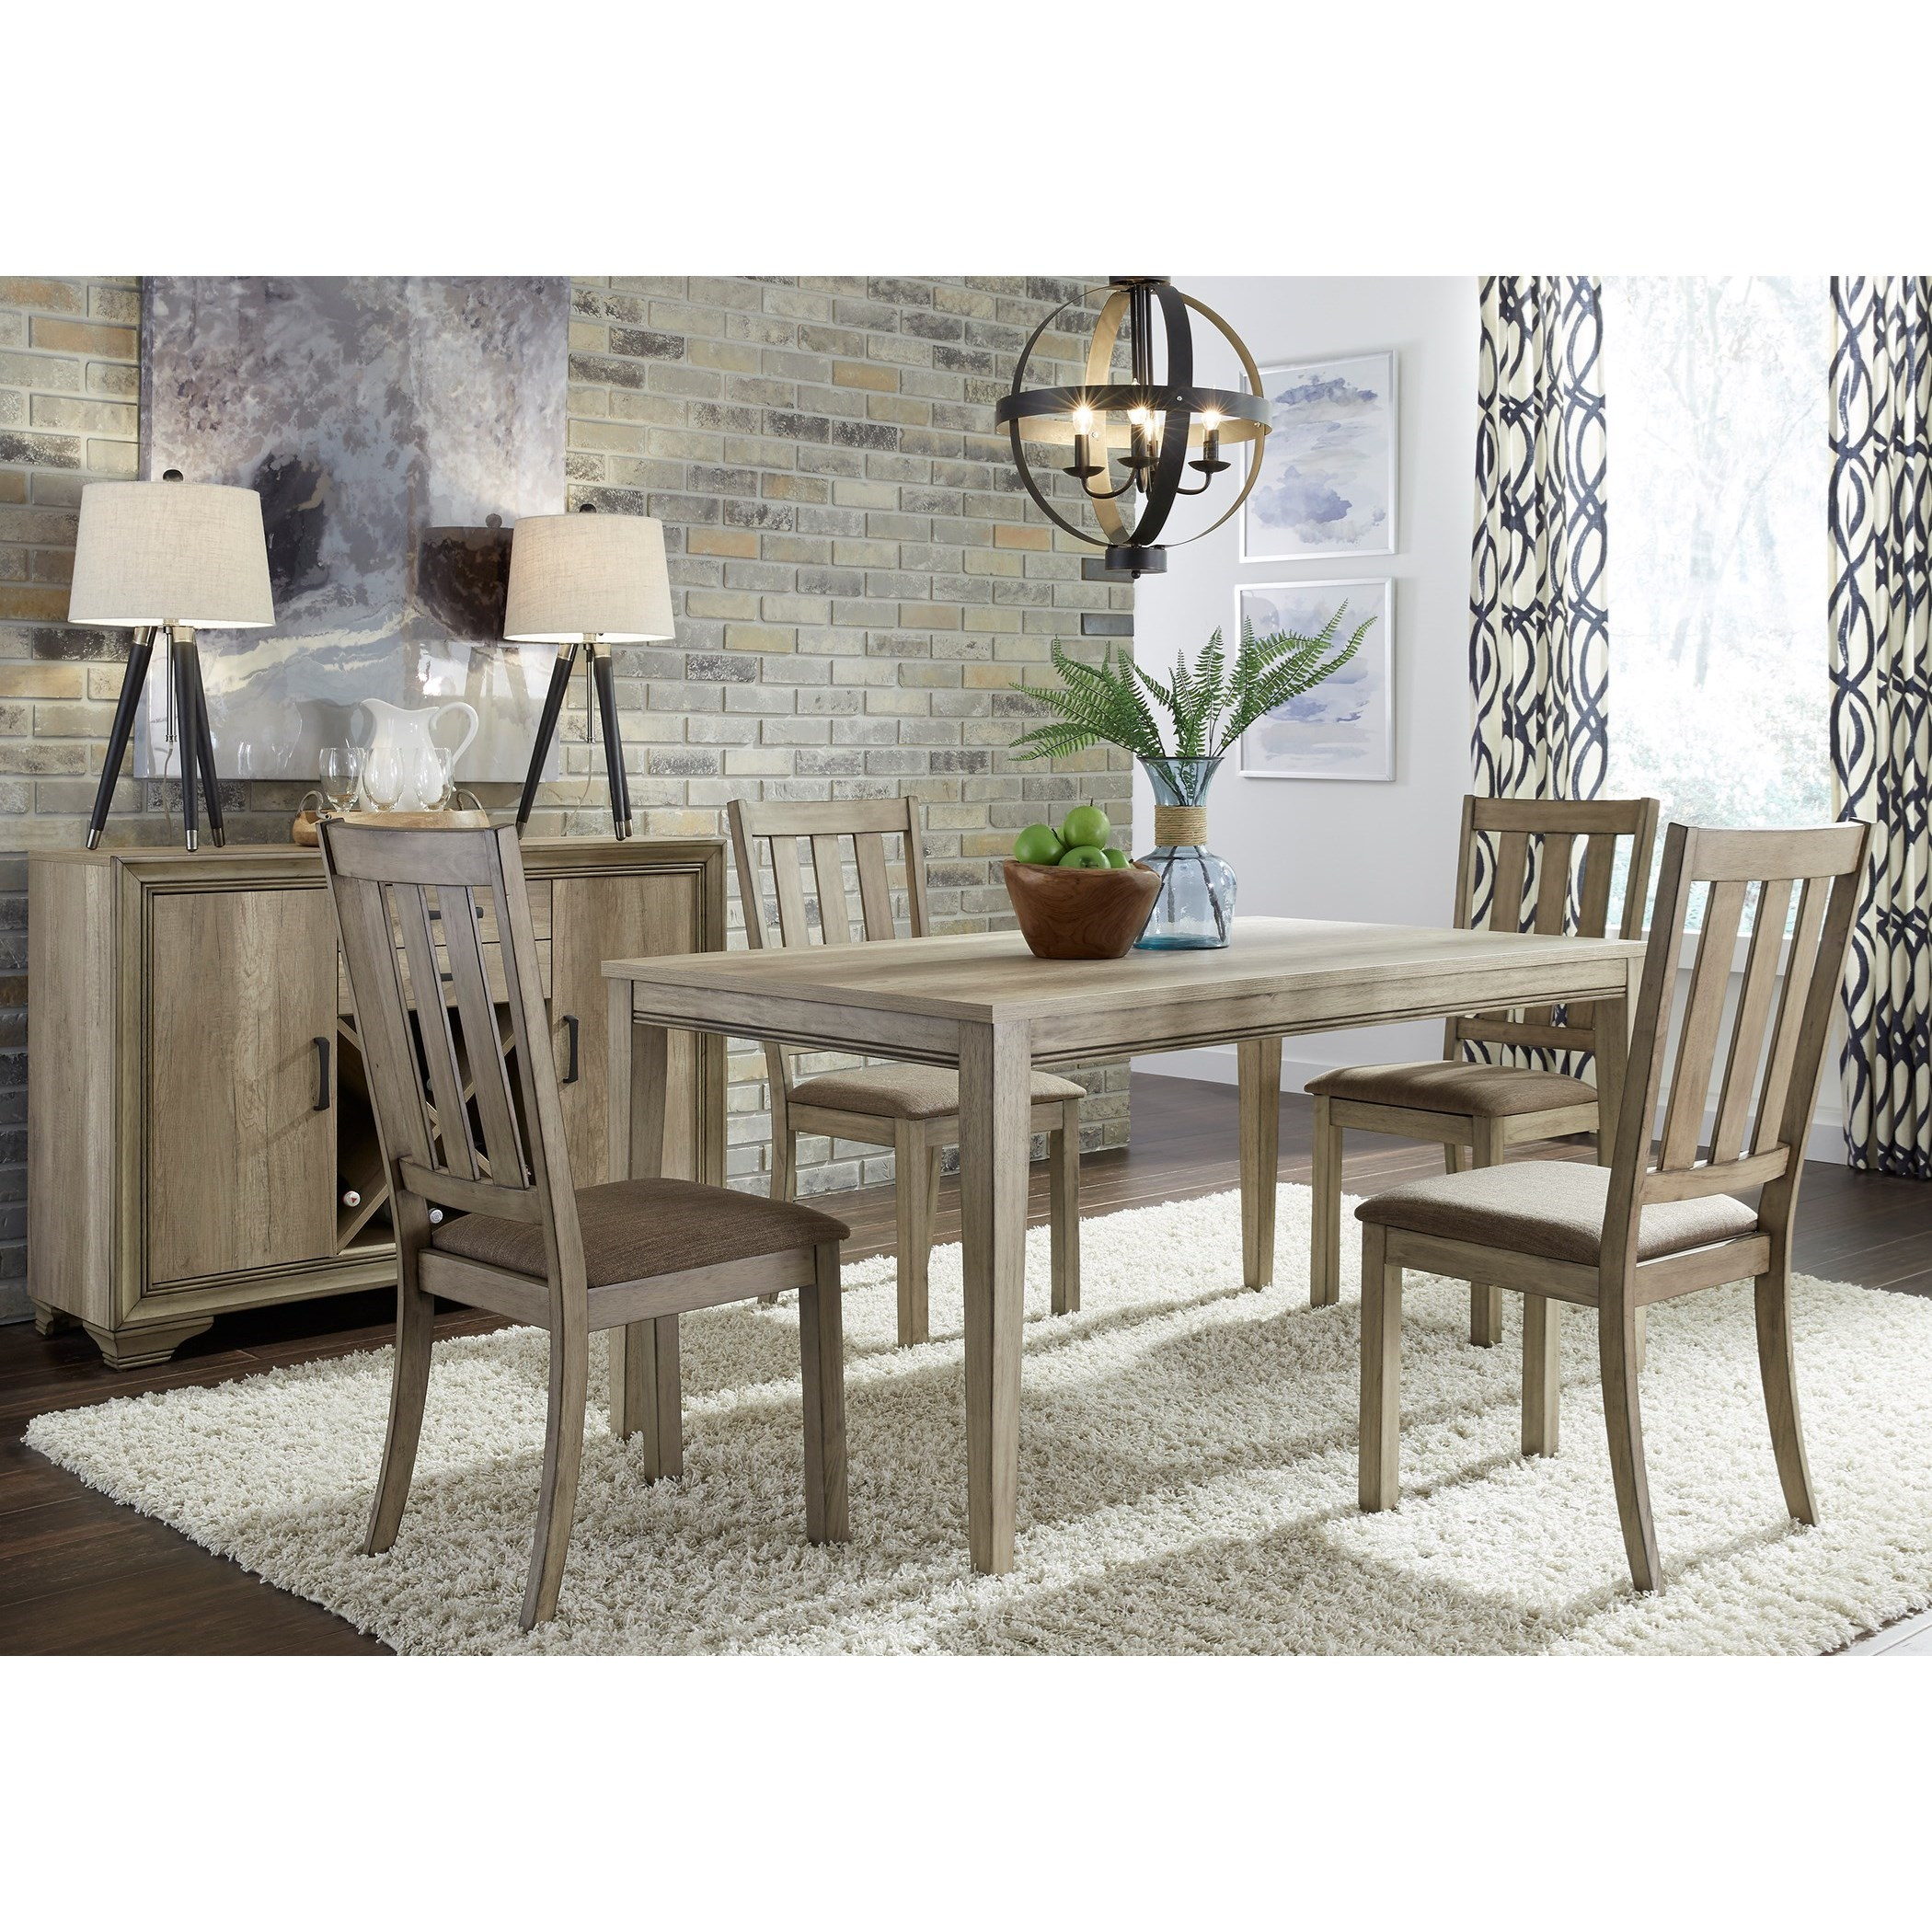 Sun Valley 5 Piece Leg Table Set  by Liberty Furniture at Lapeer Furniture & Mattress Center